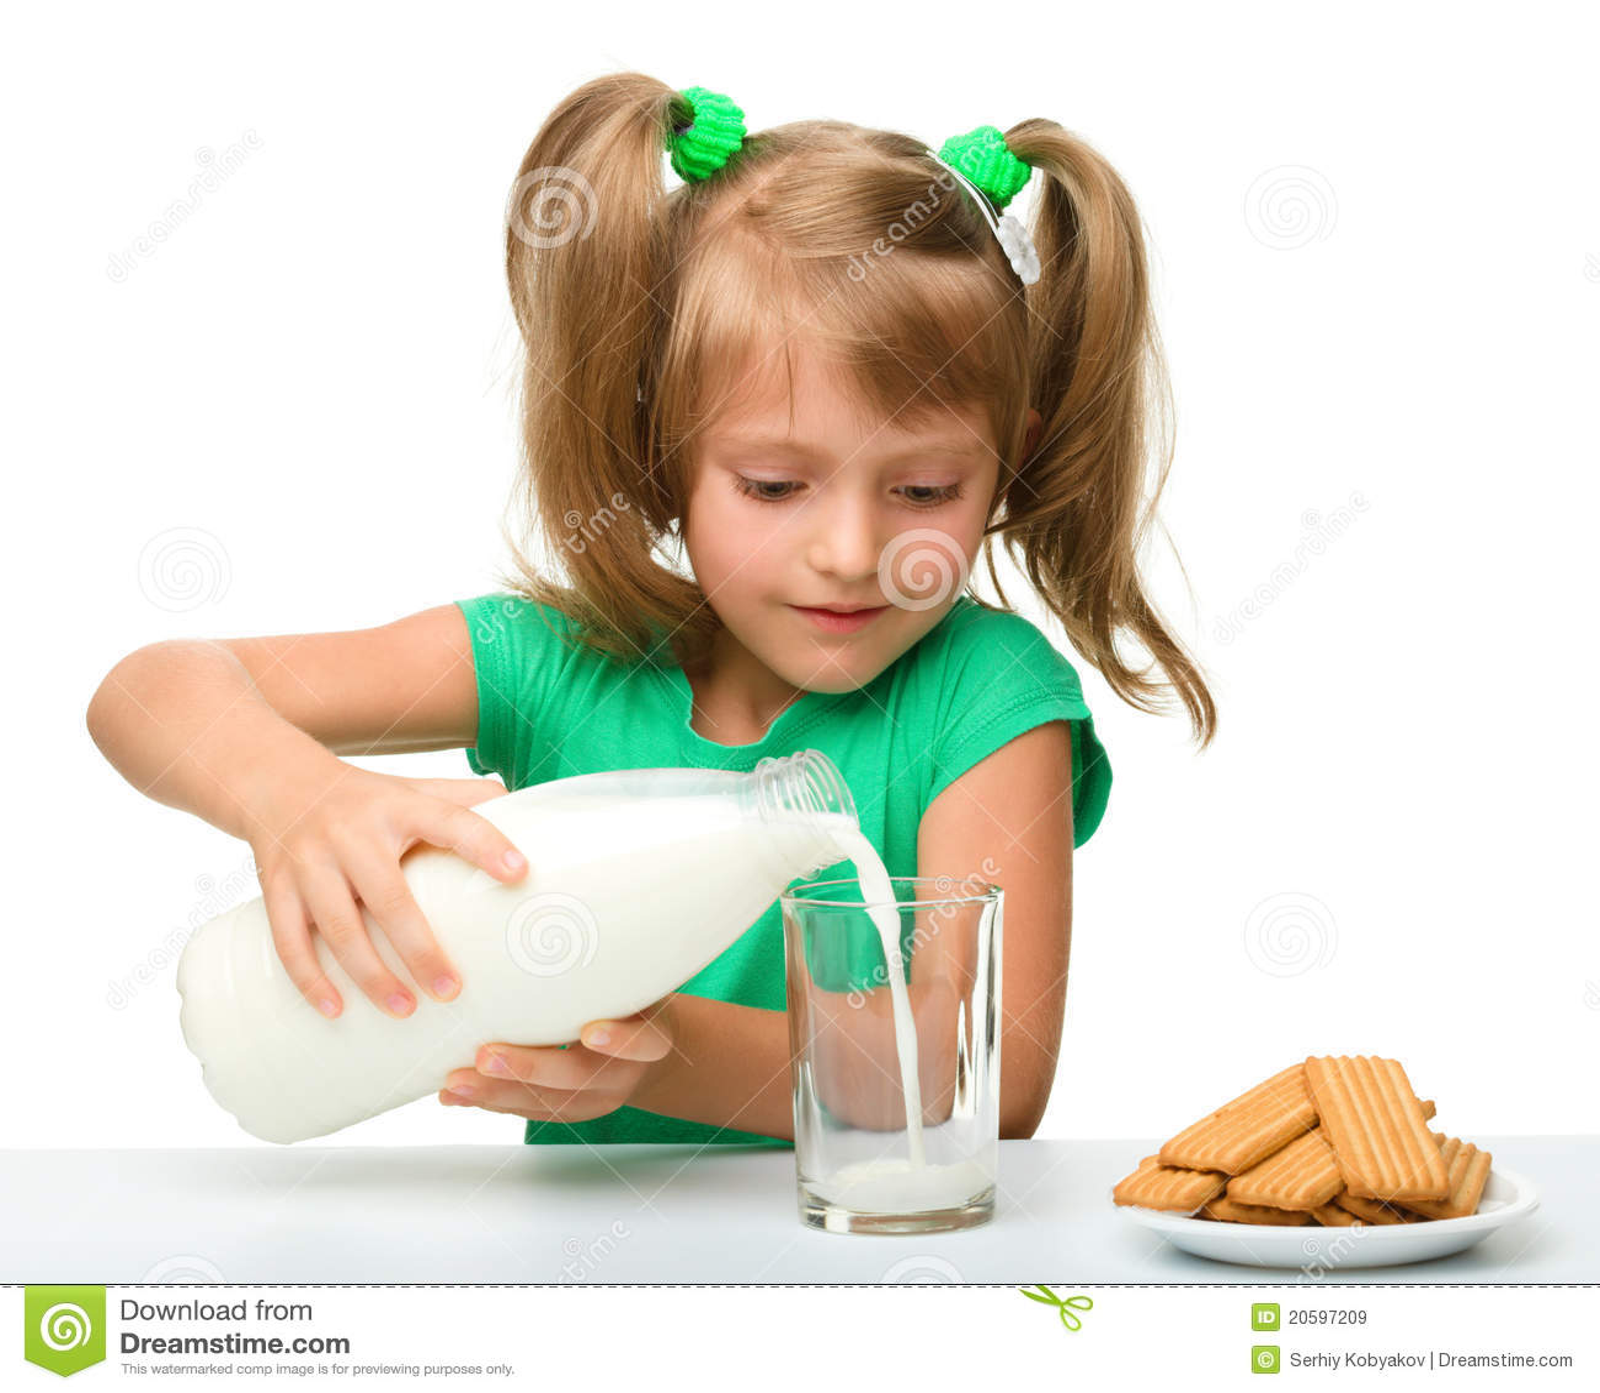 single women in dairy दूध कैसे निकाले मशीन से & कीमत सब्सिडी जाने|cow milk machine price/subsidy in india|how works - duration: 5:17 farming leader .